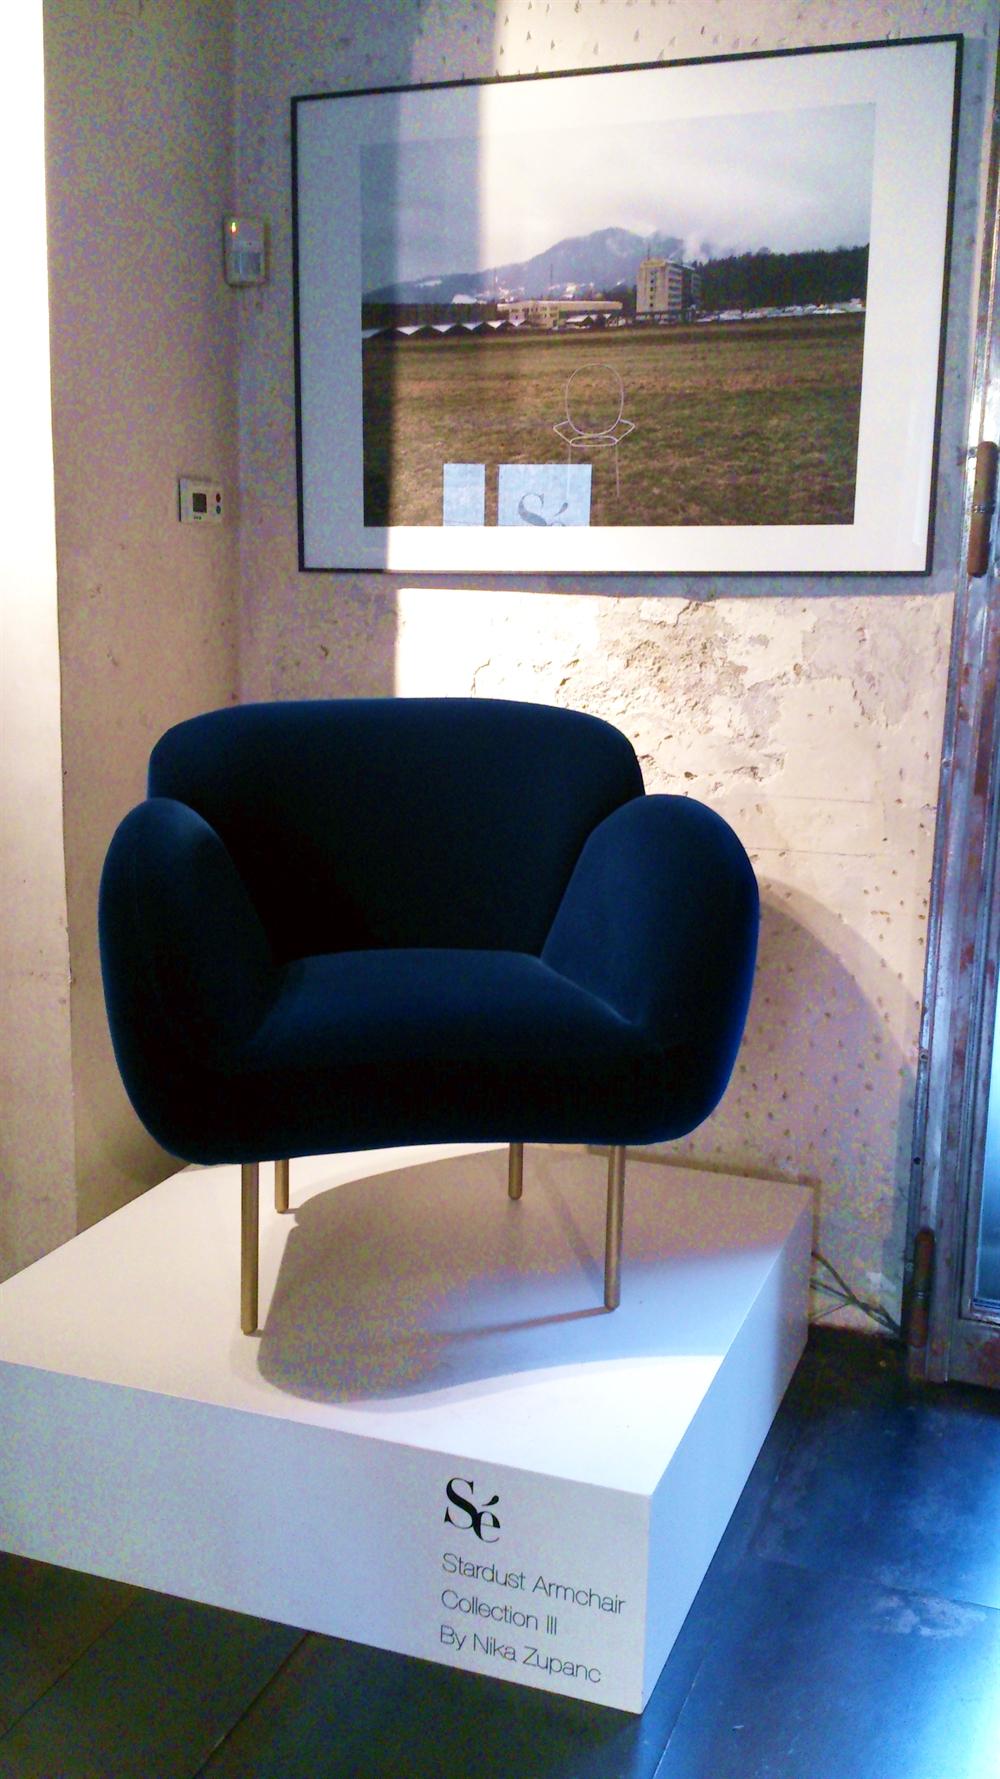 12 fuorisalone milan design week 2015 rossana orlandi nika zupanc gufram marimekko scarlet splendour interior design luxurious furniture meble luksusowe projektowanie marcel wanders